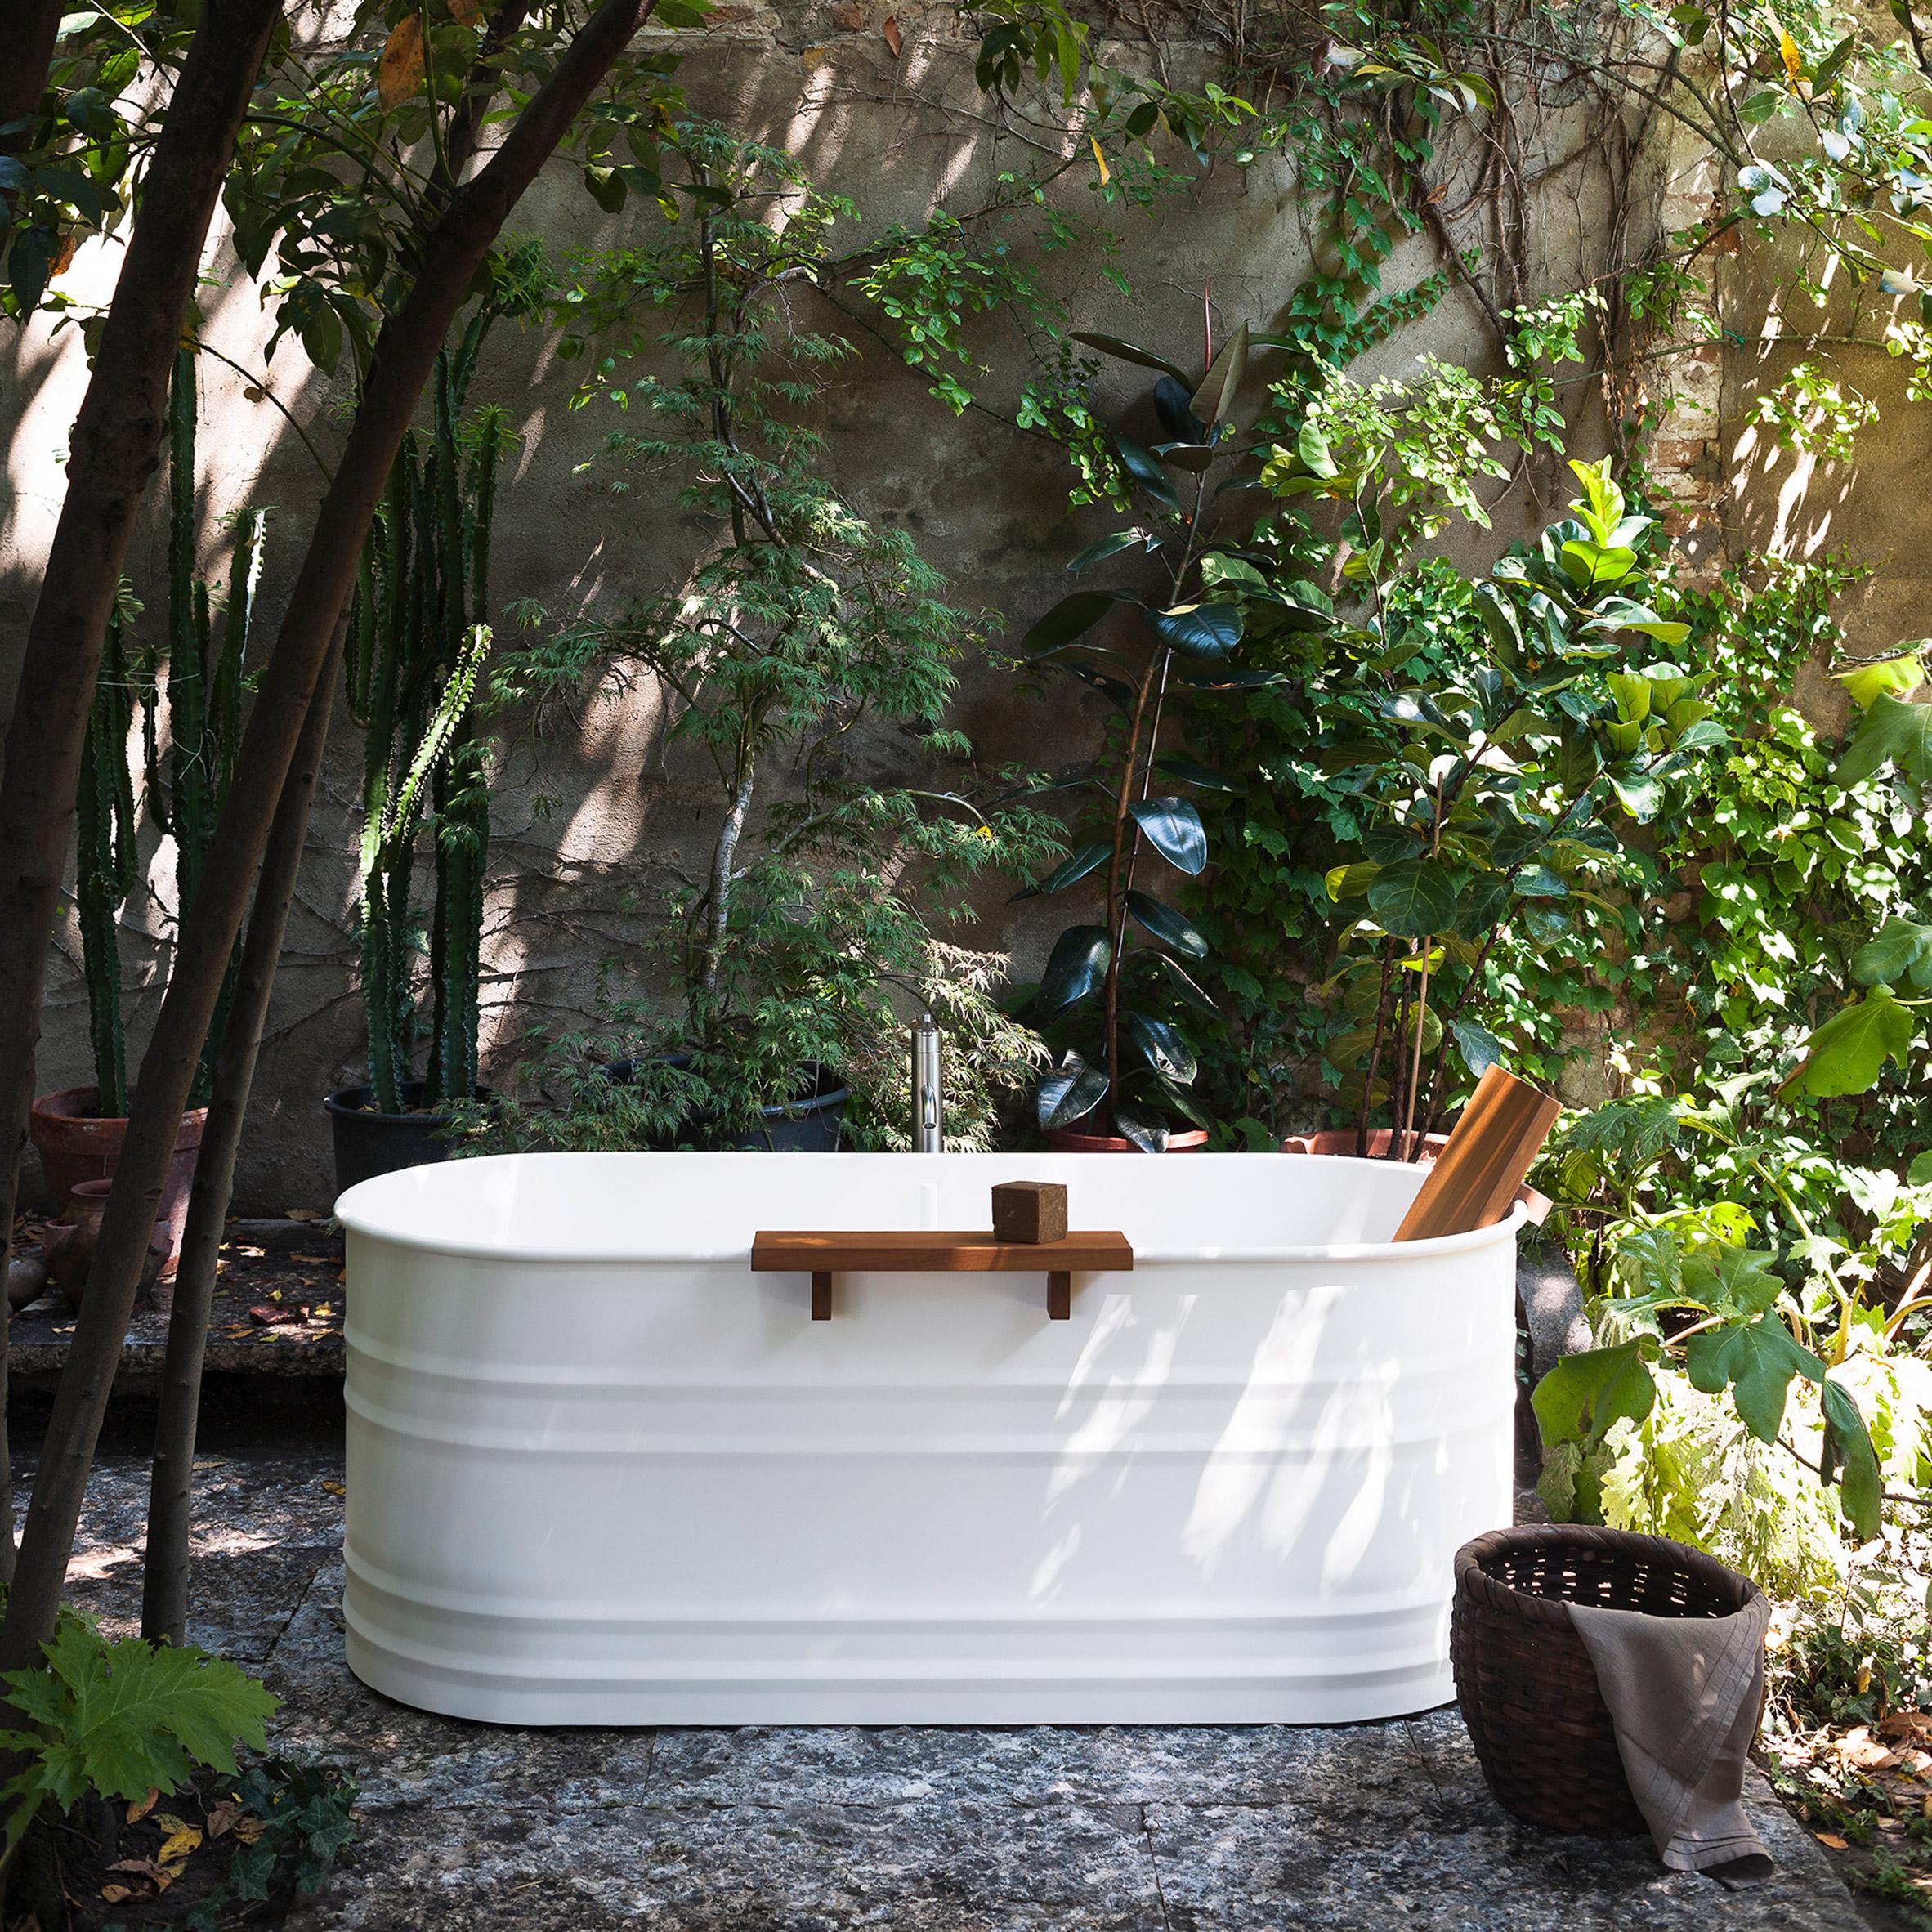 Vieques Outdoor bathroom range by Patricia Urquiola for Agape